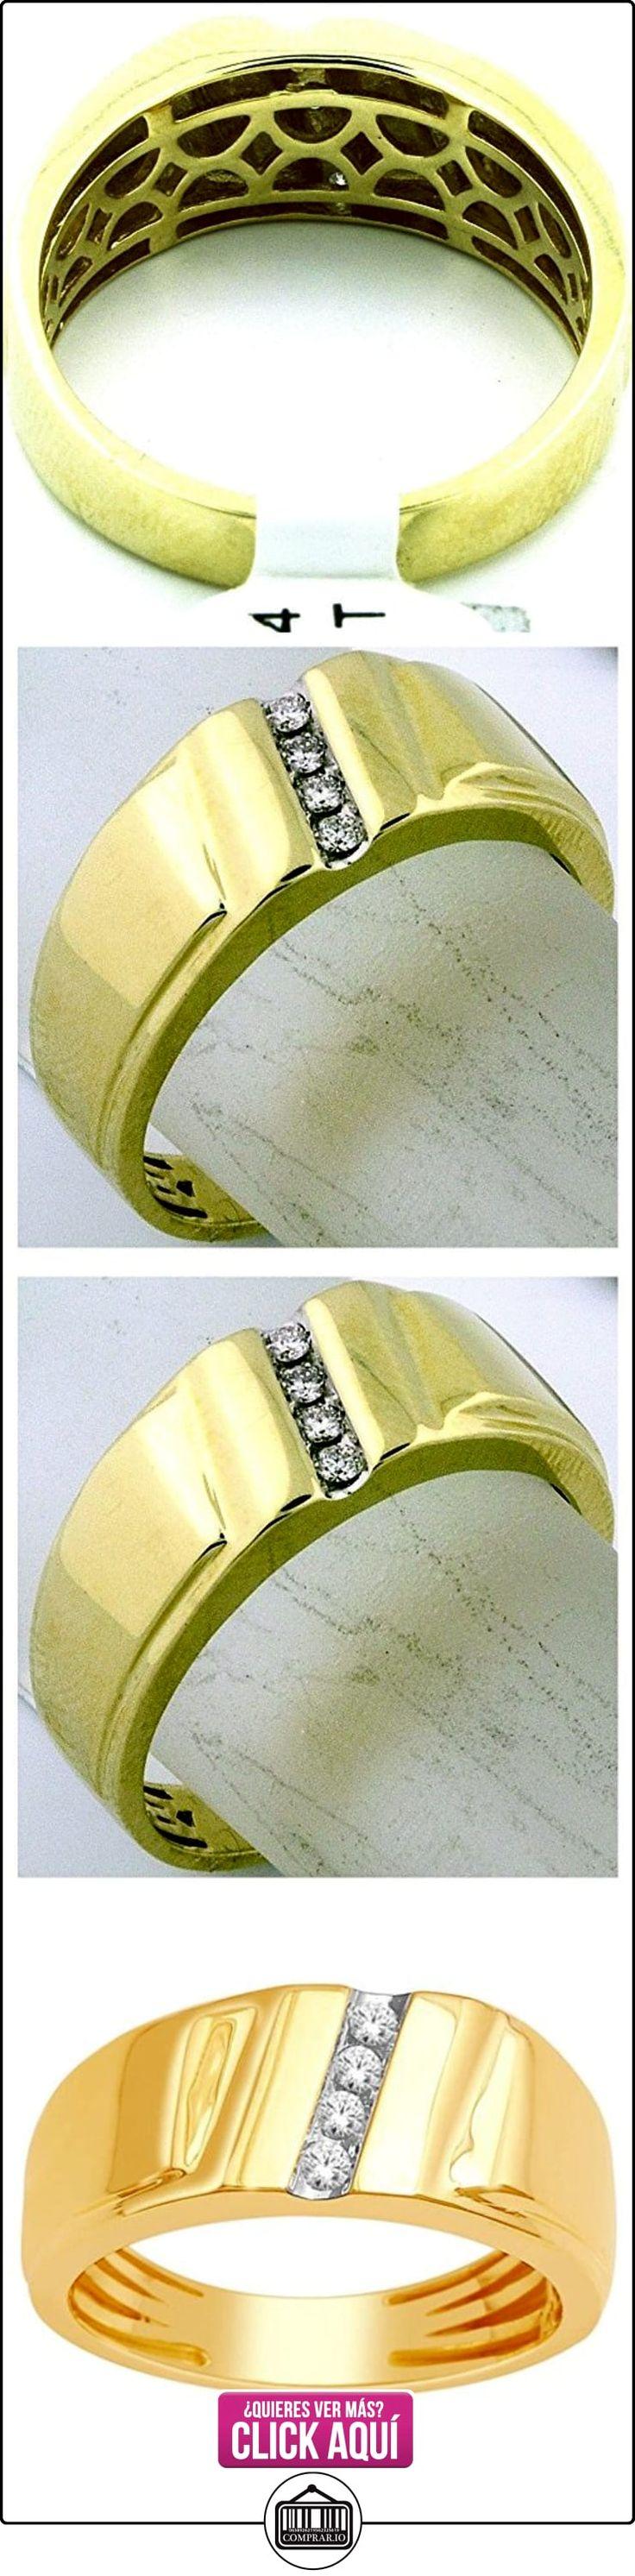 rings-midwestjewellery. com Hombre Boda Banda 10K oro 8,5mm de ancho 1/10cttw Diamonds Comfort Fit (I/J Color 0,1quilates)  ✿ Joyas para hombres especiales - lujo ✿ ▬► Ver oferta: https://comprar.io/goto/B00O2ESS40